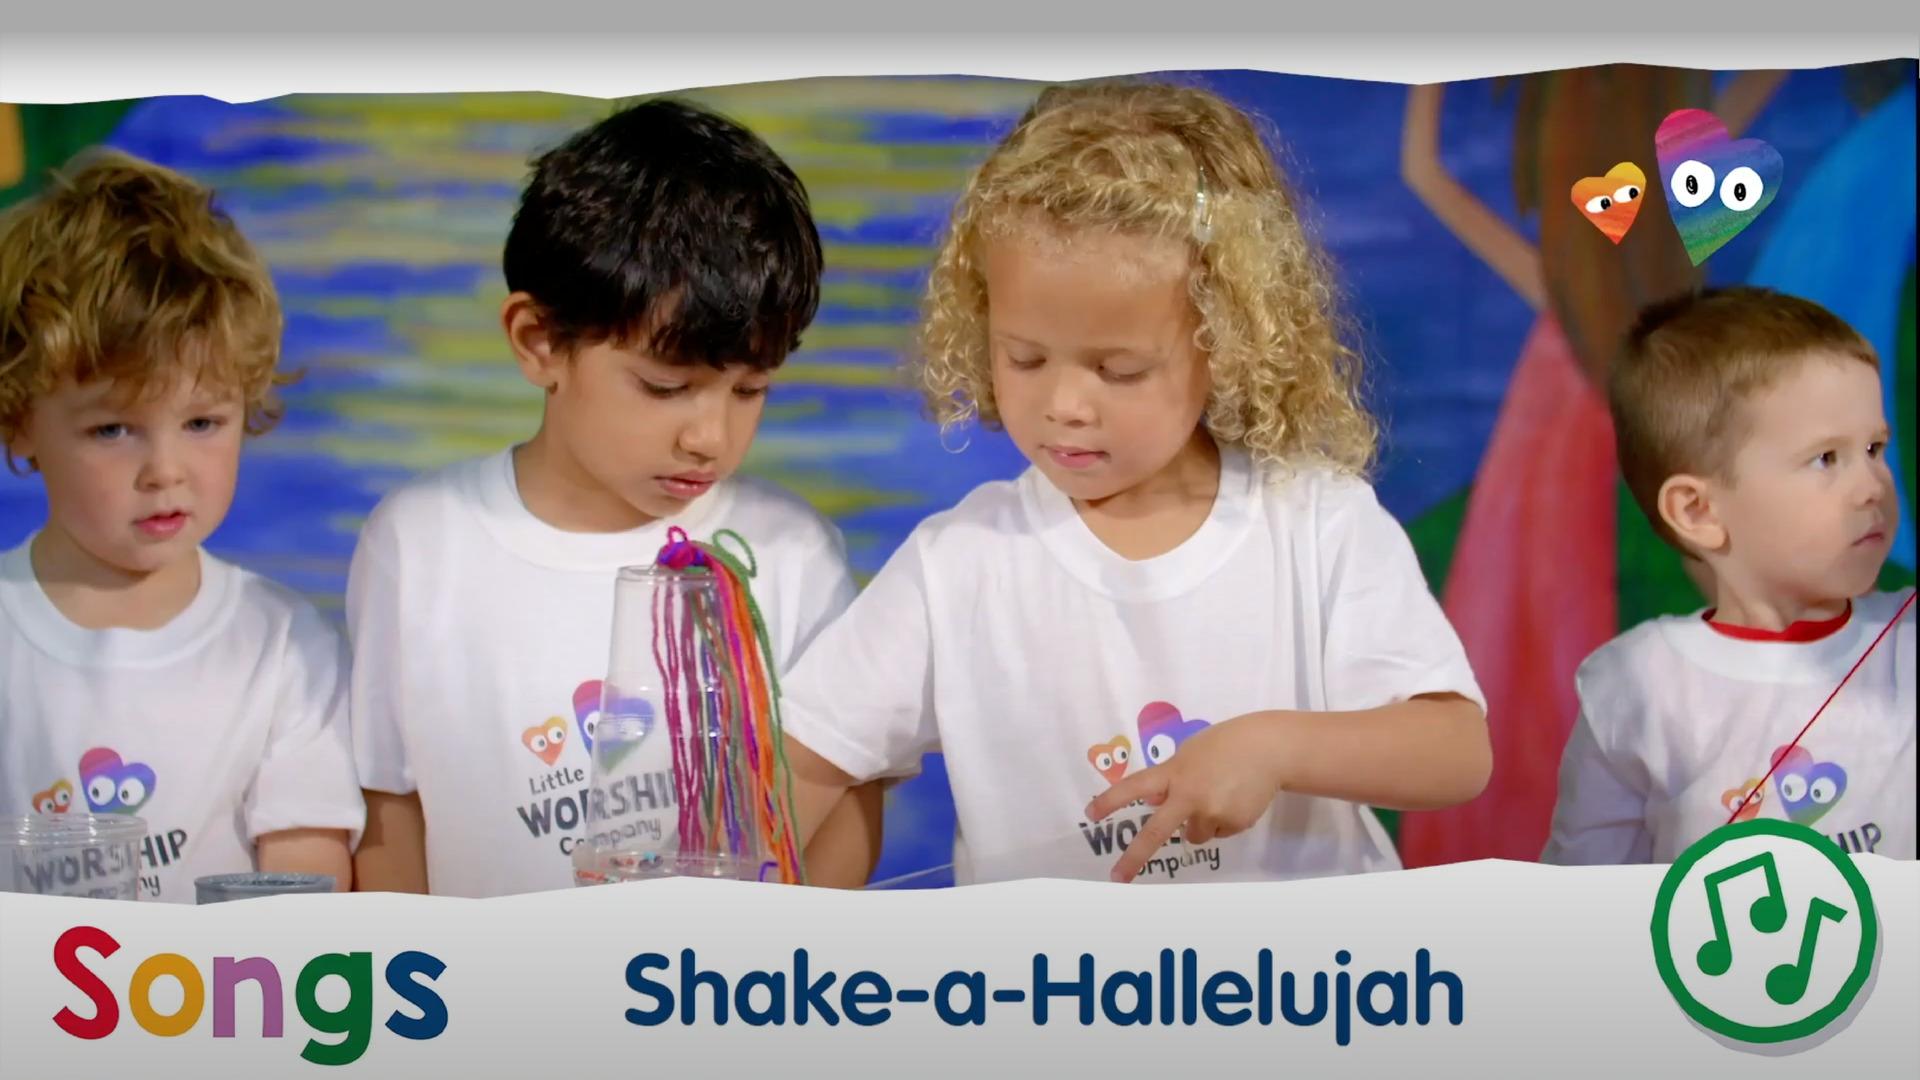 Shake-a-Hallelujah